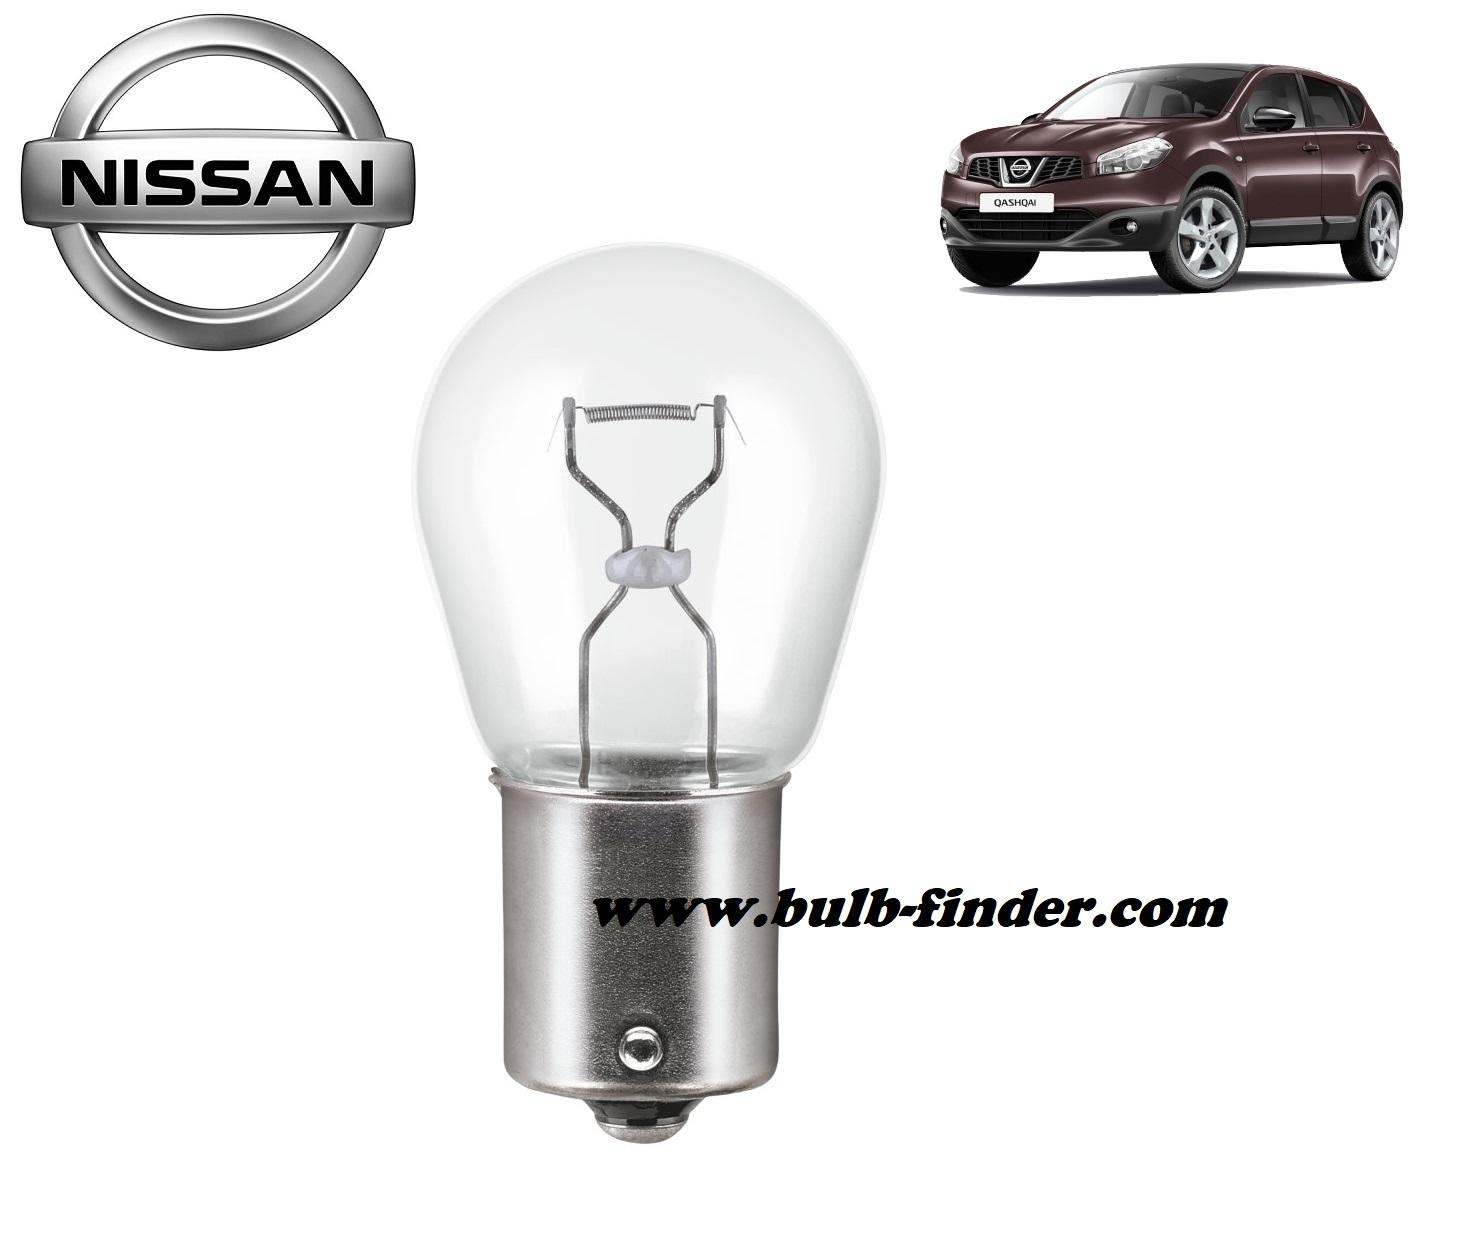 Nissan Qashqai bulb model REAR FOG LAMP